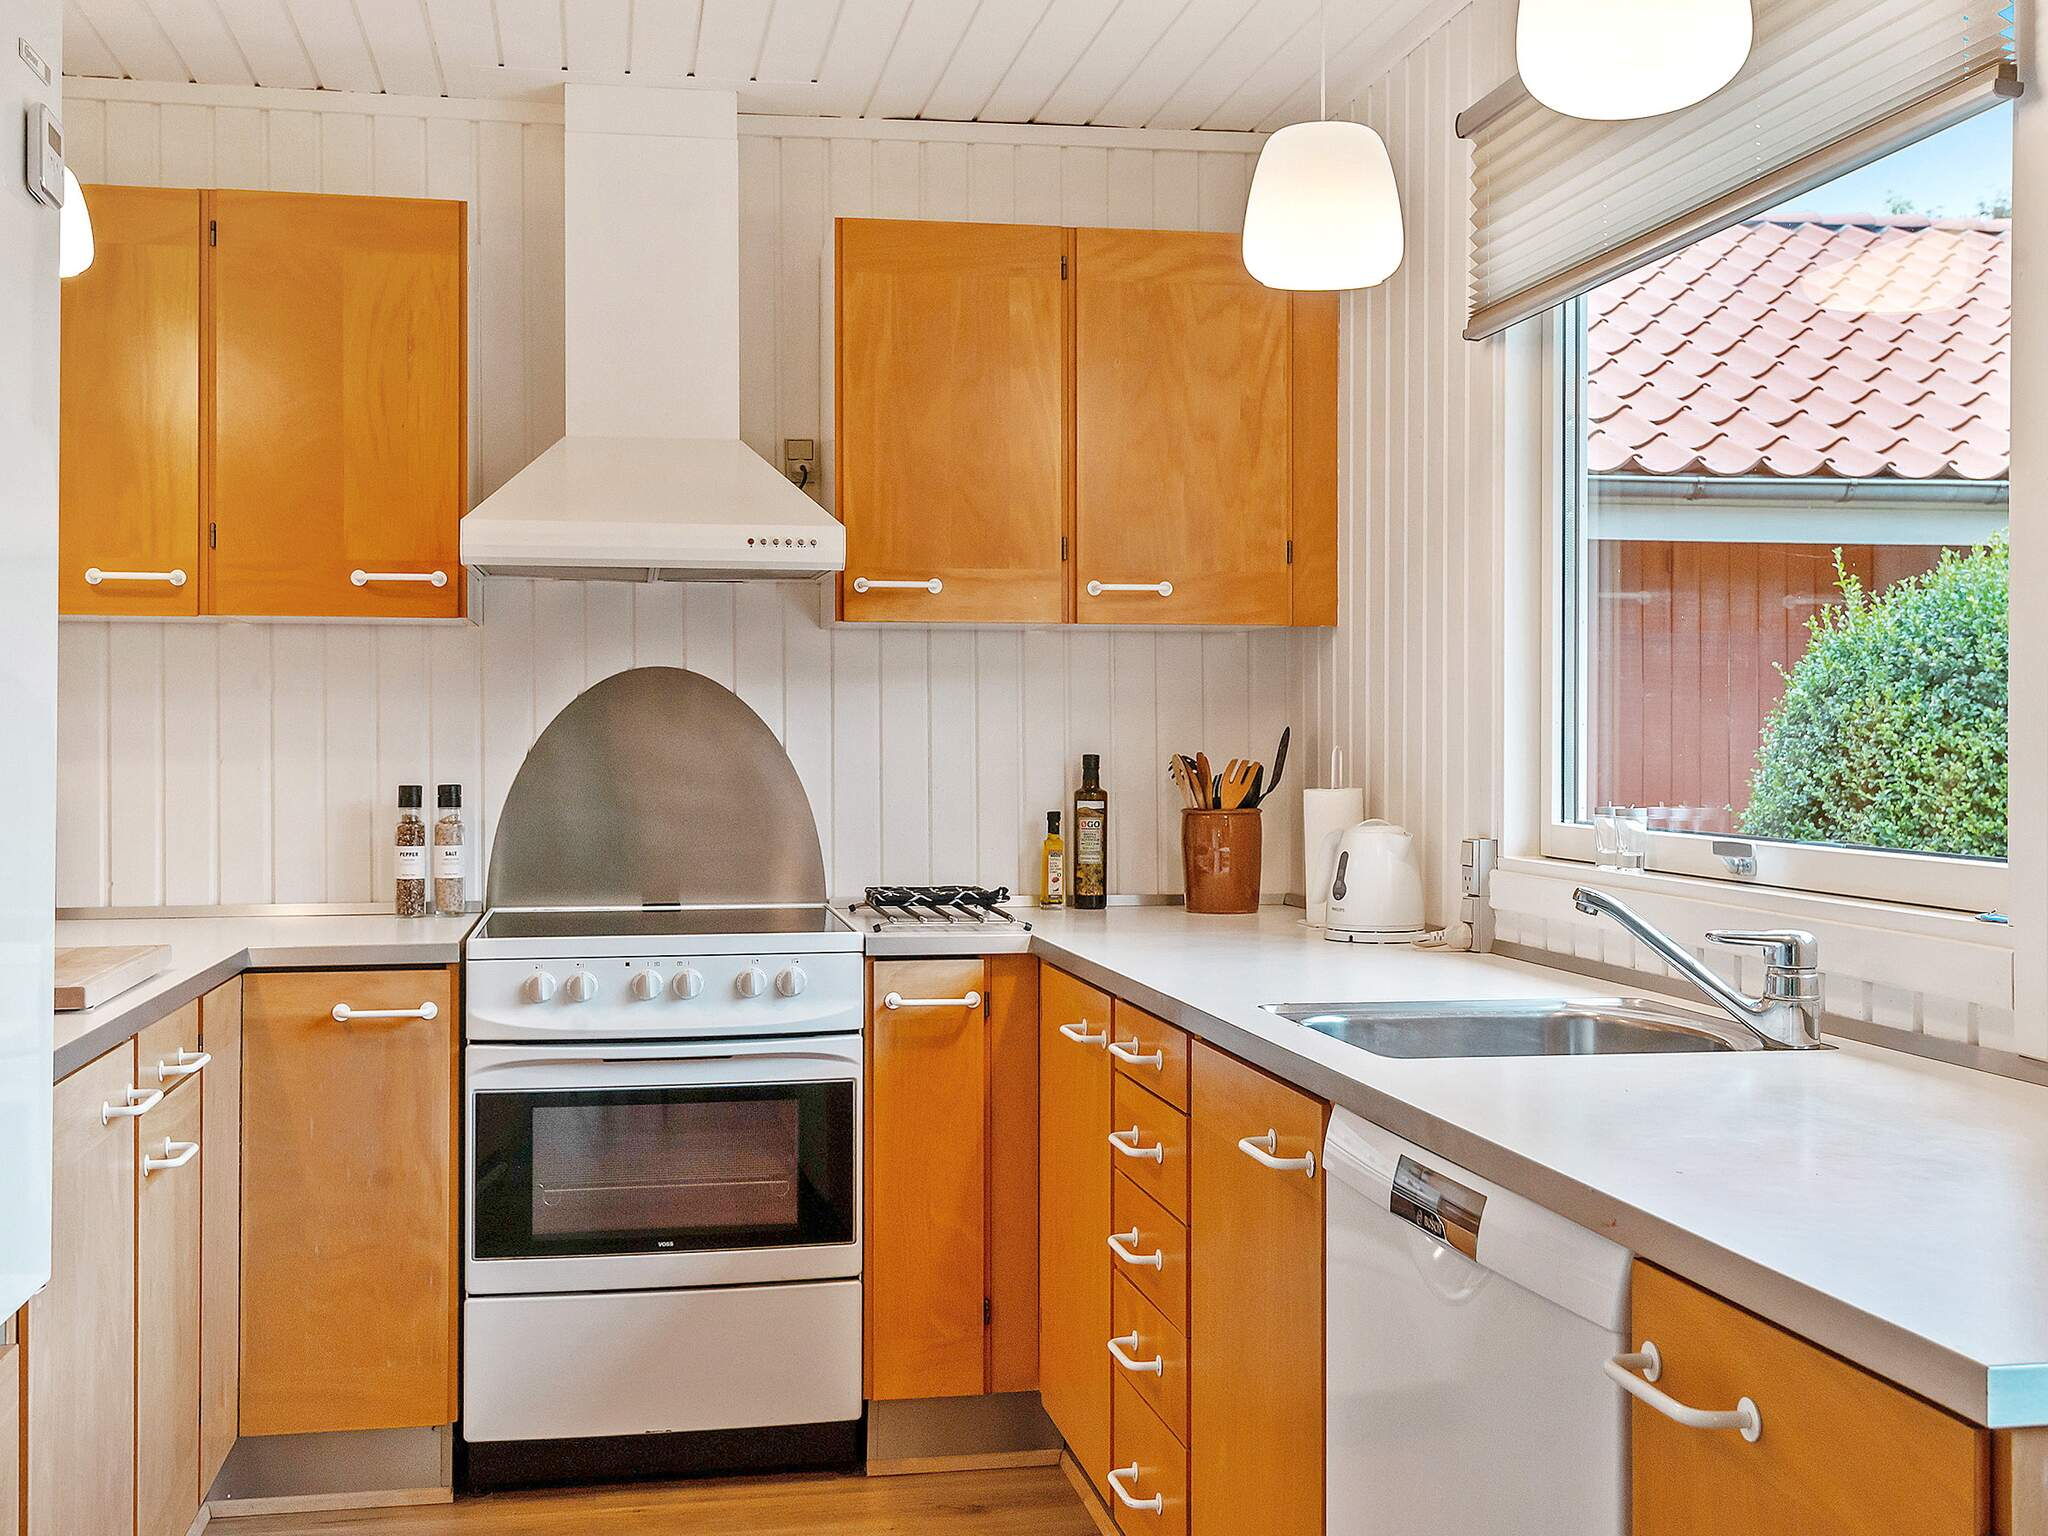 Ferienhaus Virksund (2561596), Virksund, , Limfjord, Dänemark, Bild 3